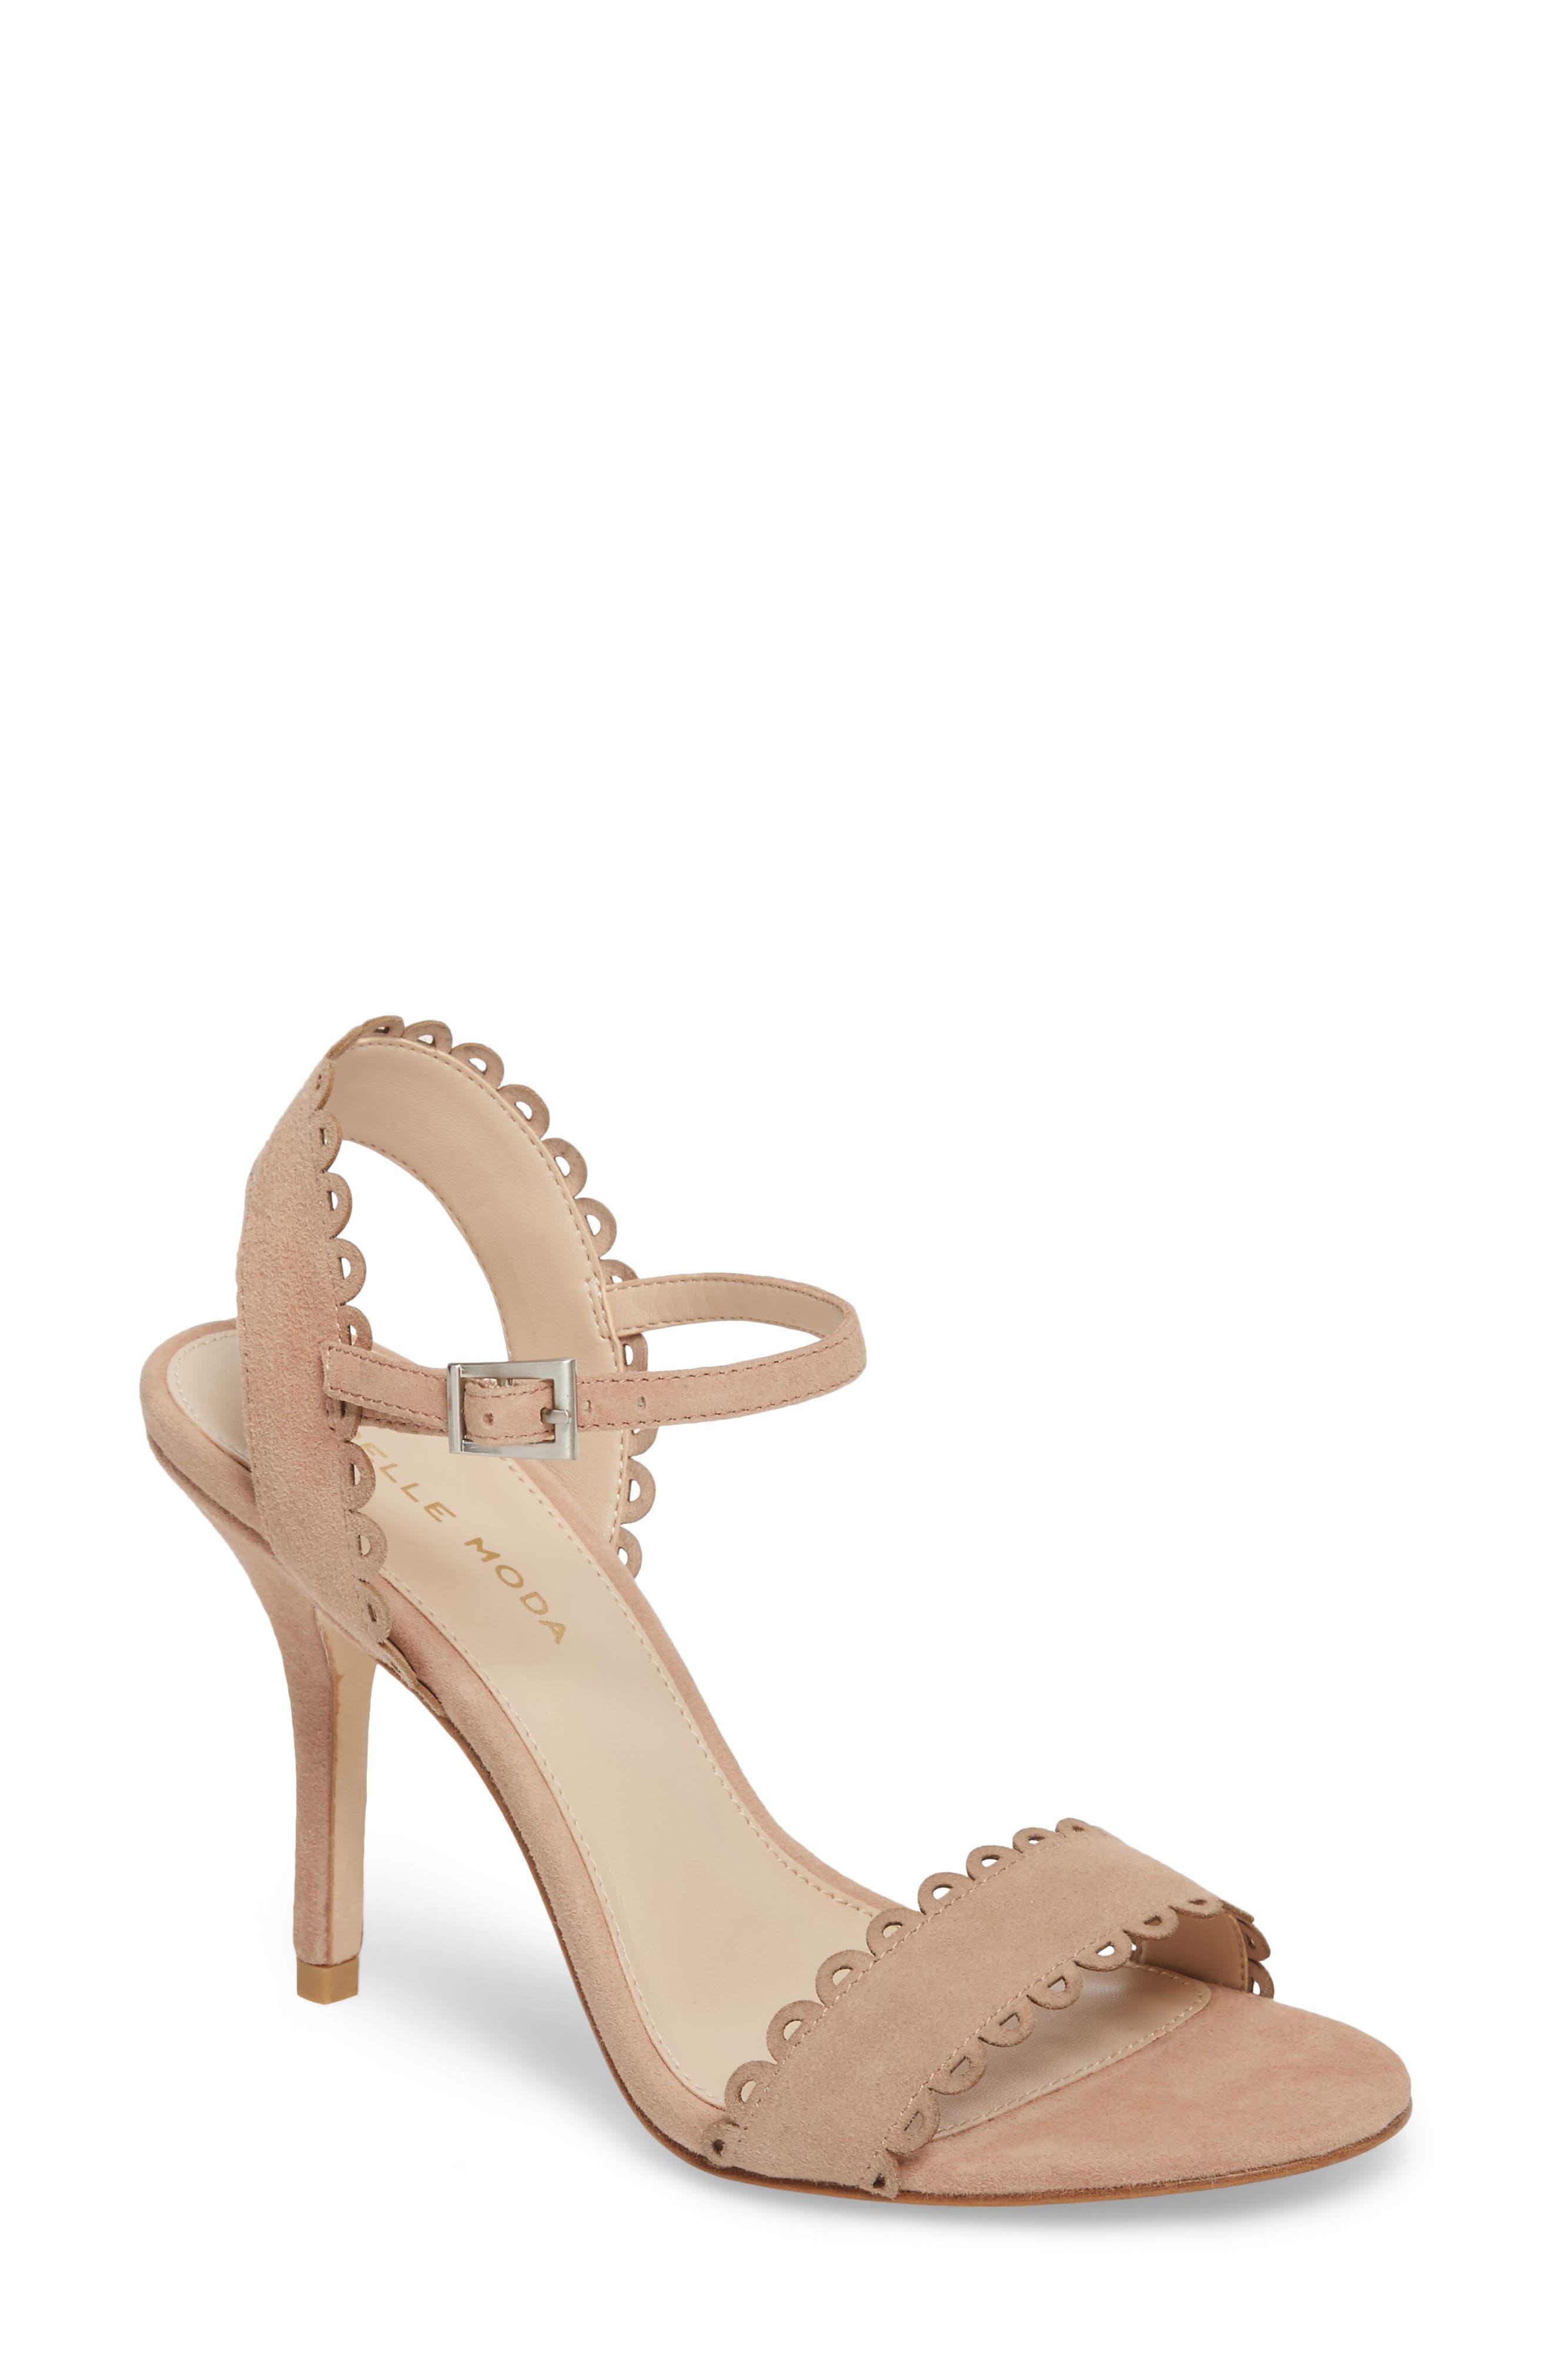 Main Image - Pelle Moda Karen Scallop Ankle Strap Sandal (Women)